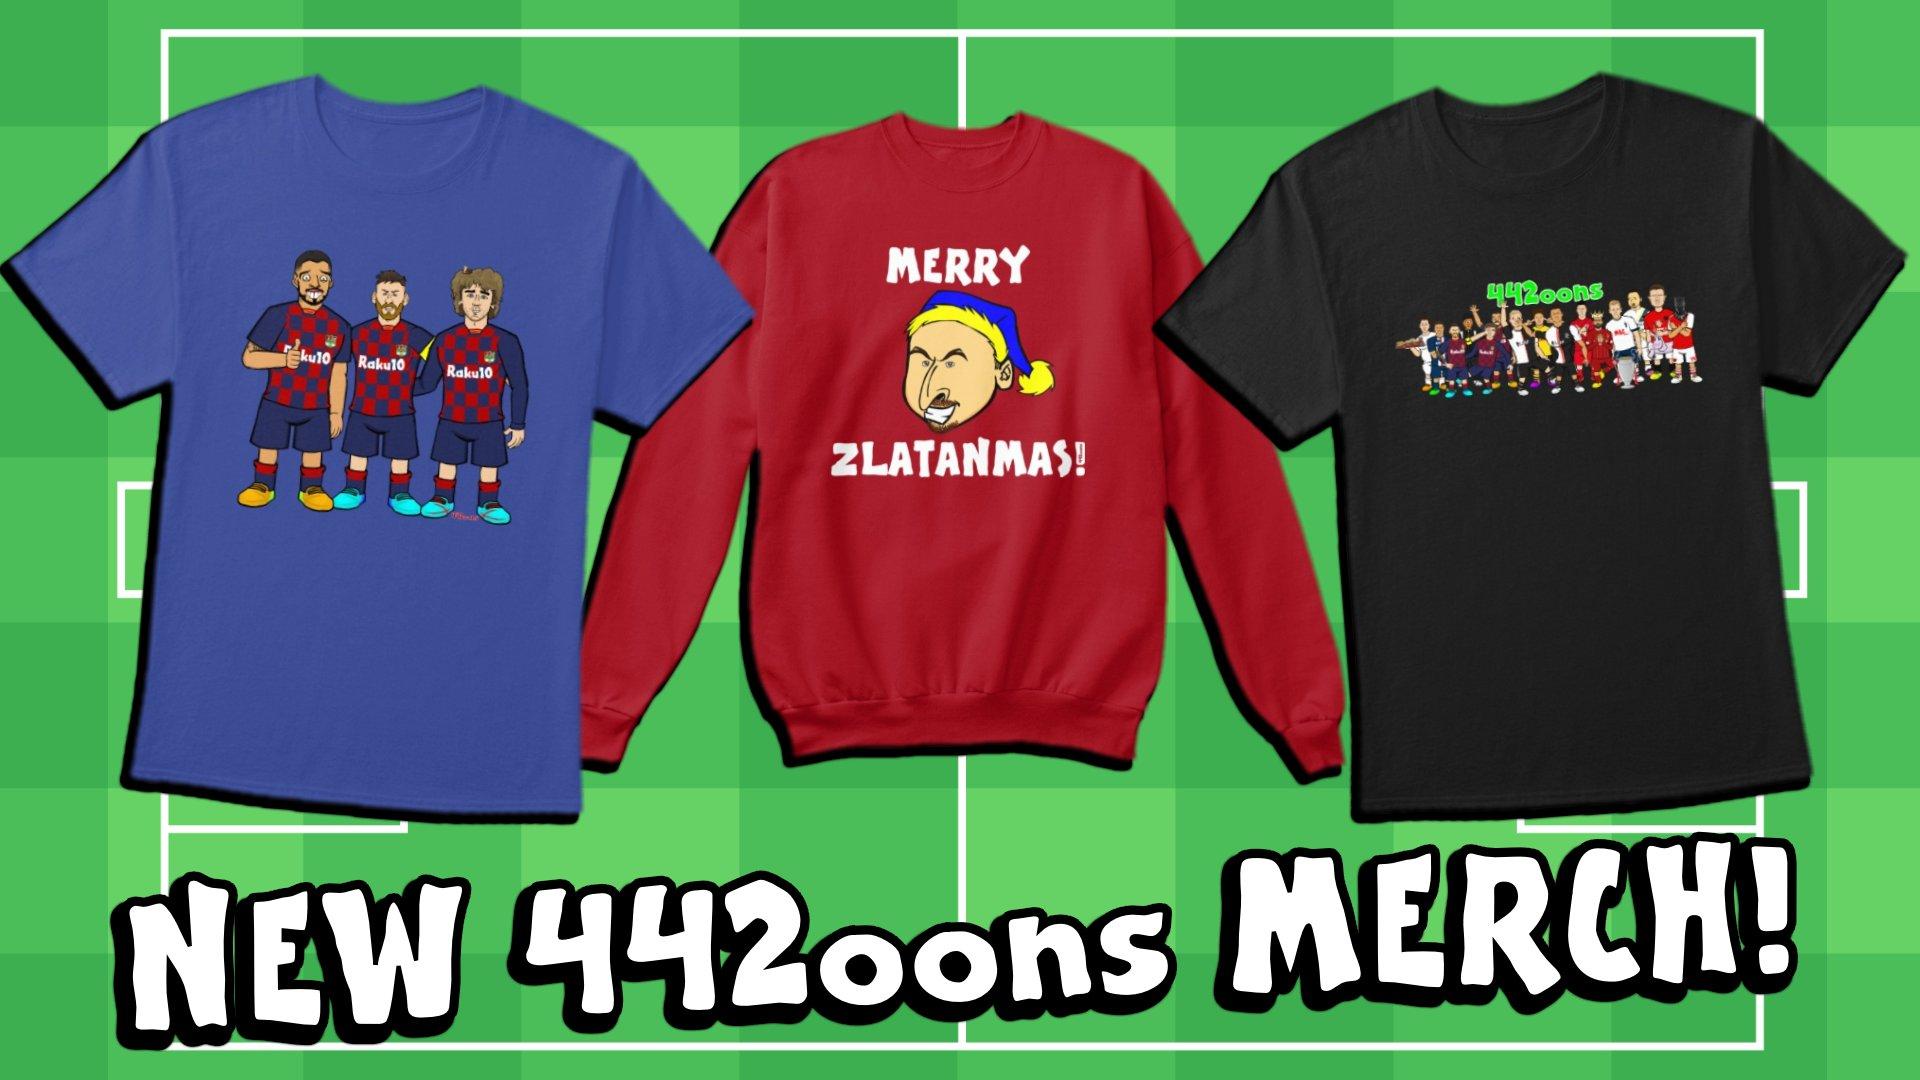 442oons Shirts